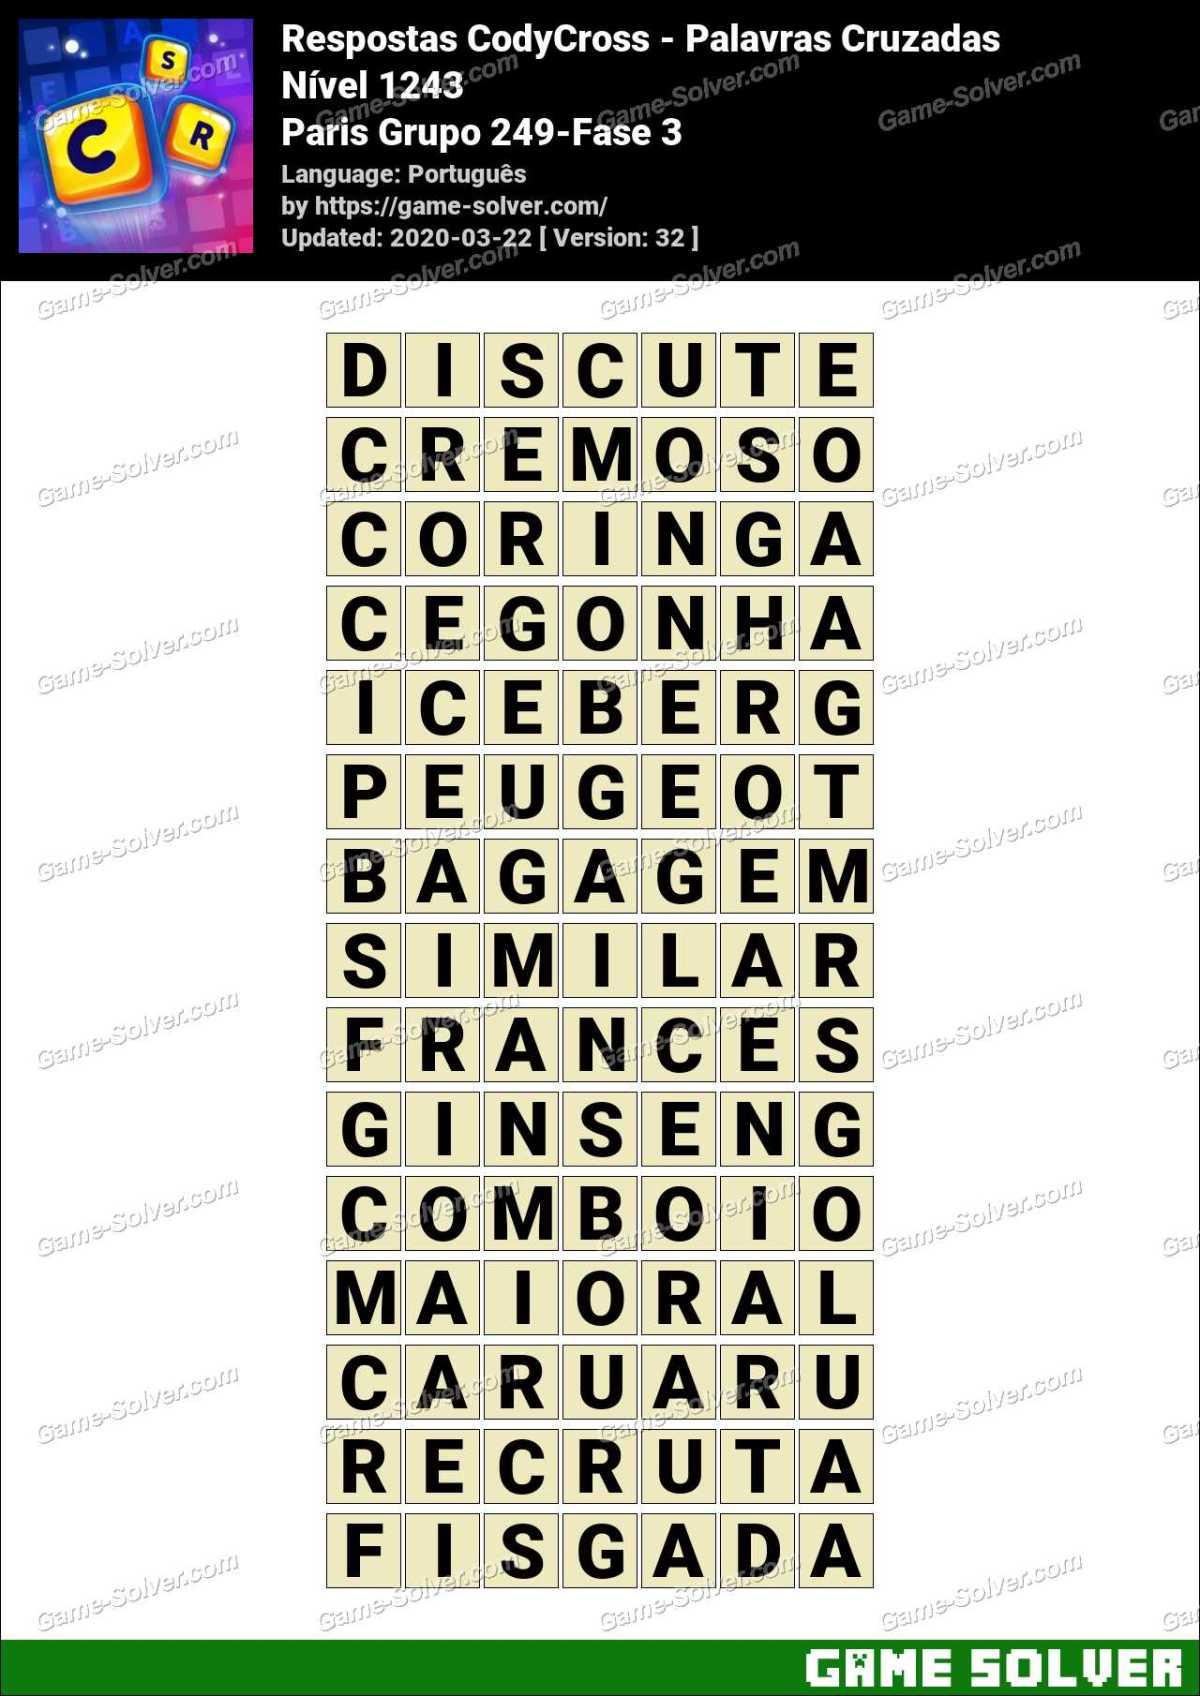 Respostas CodyCross Paris Grupo 249-Fase 3